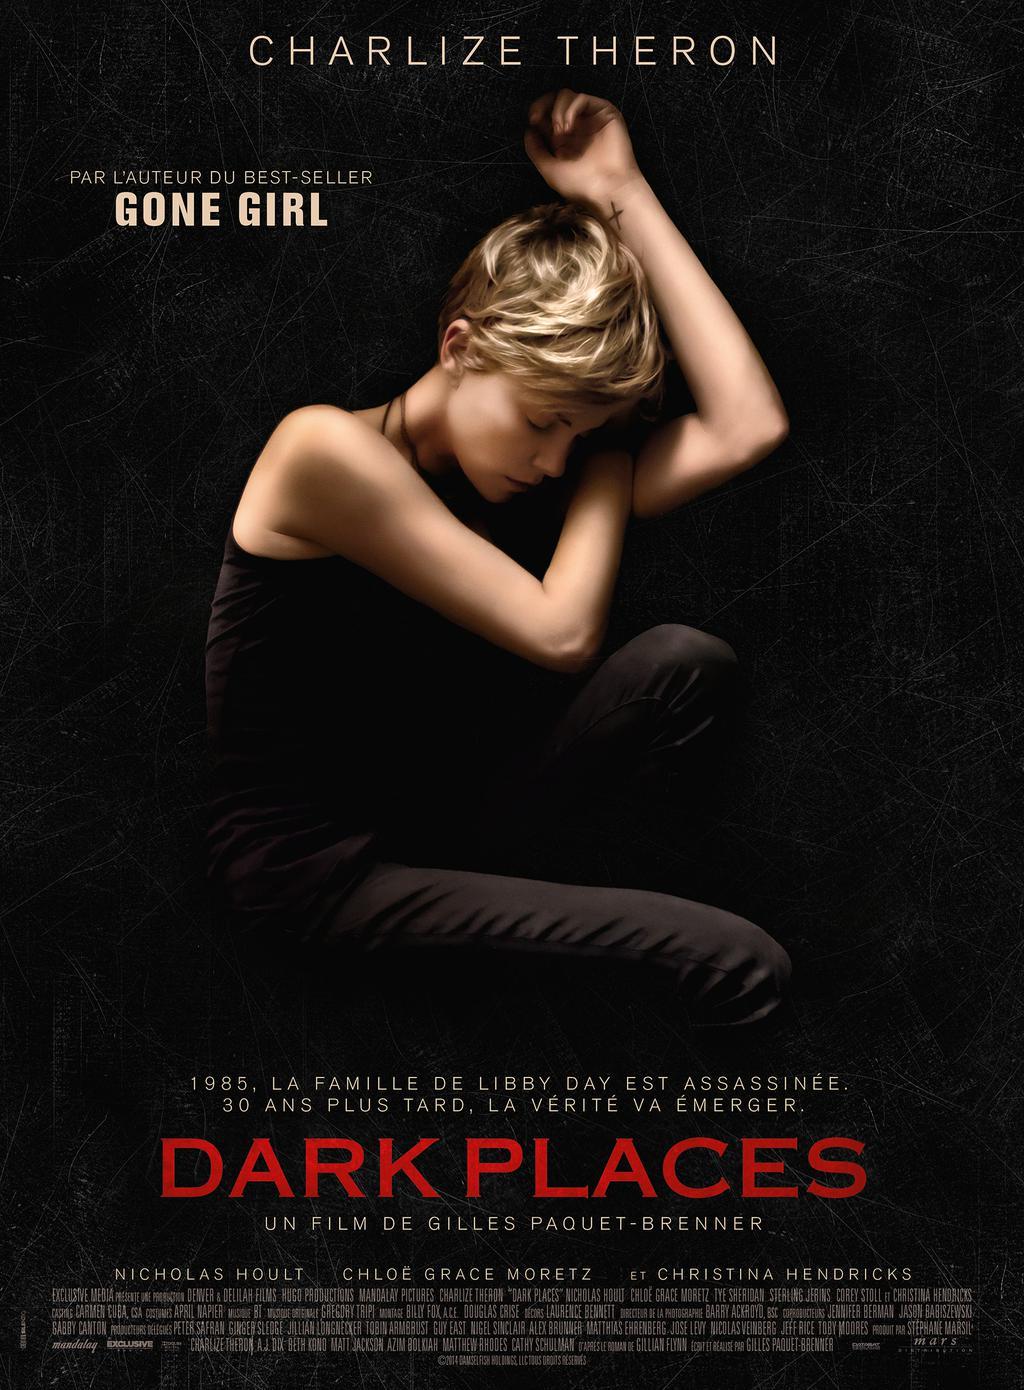 darkplaces.jpg